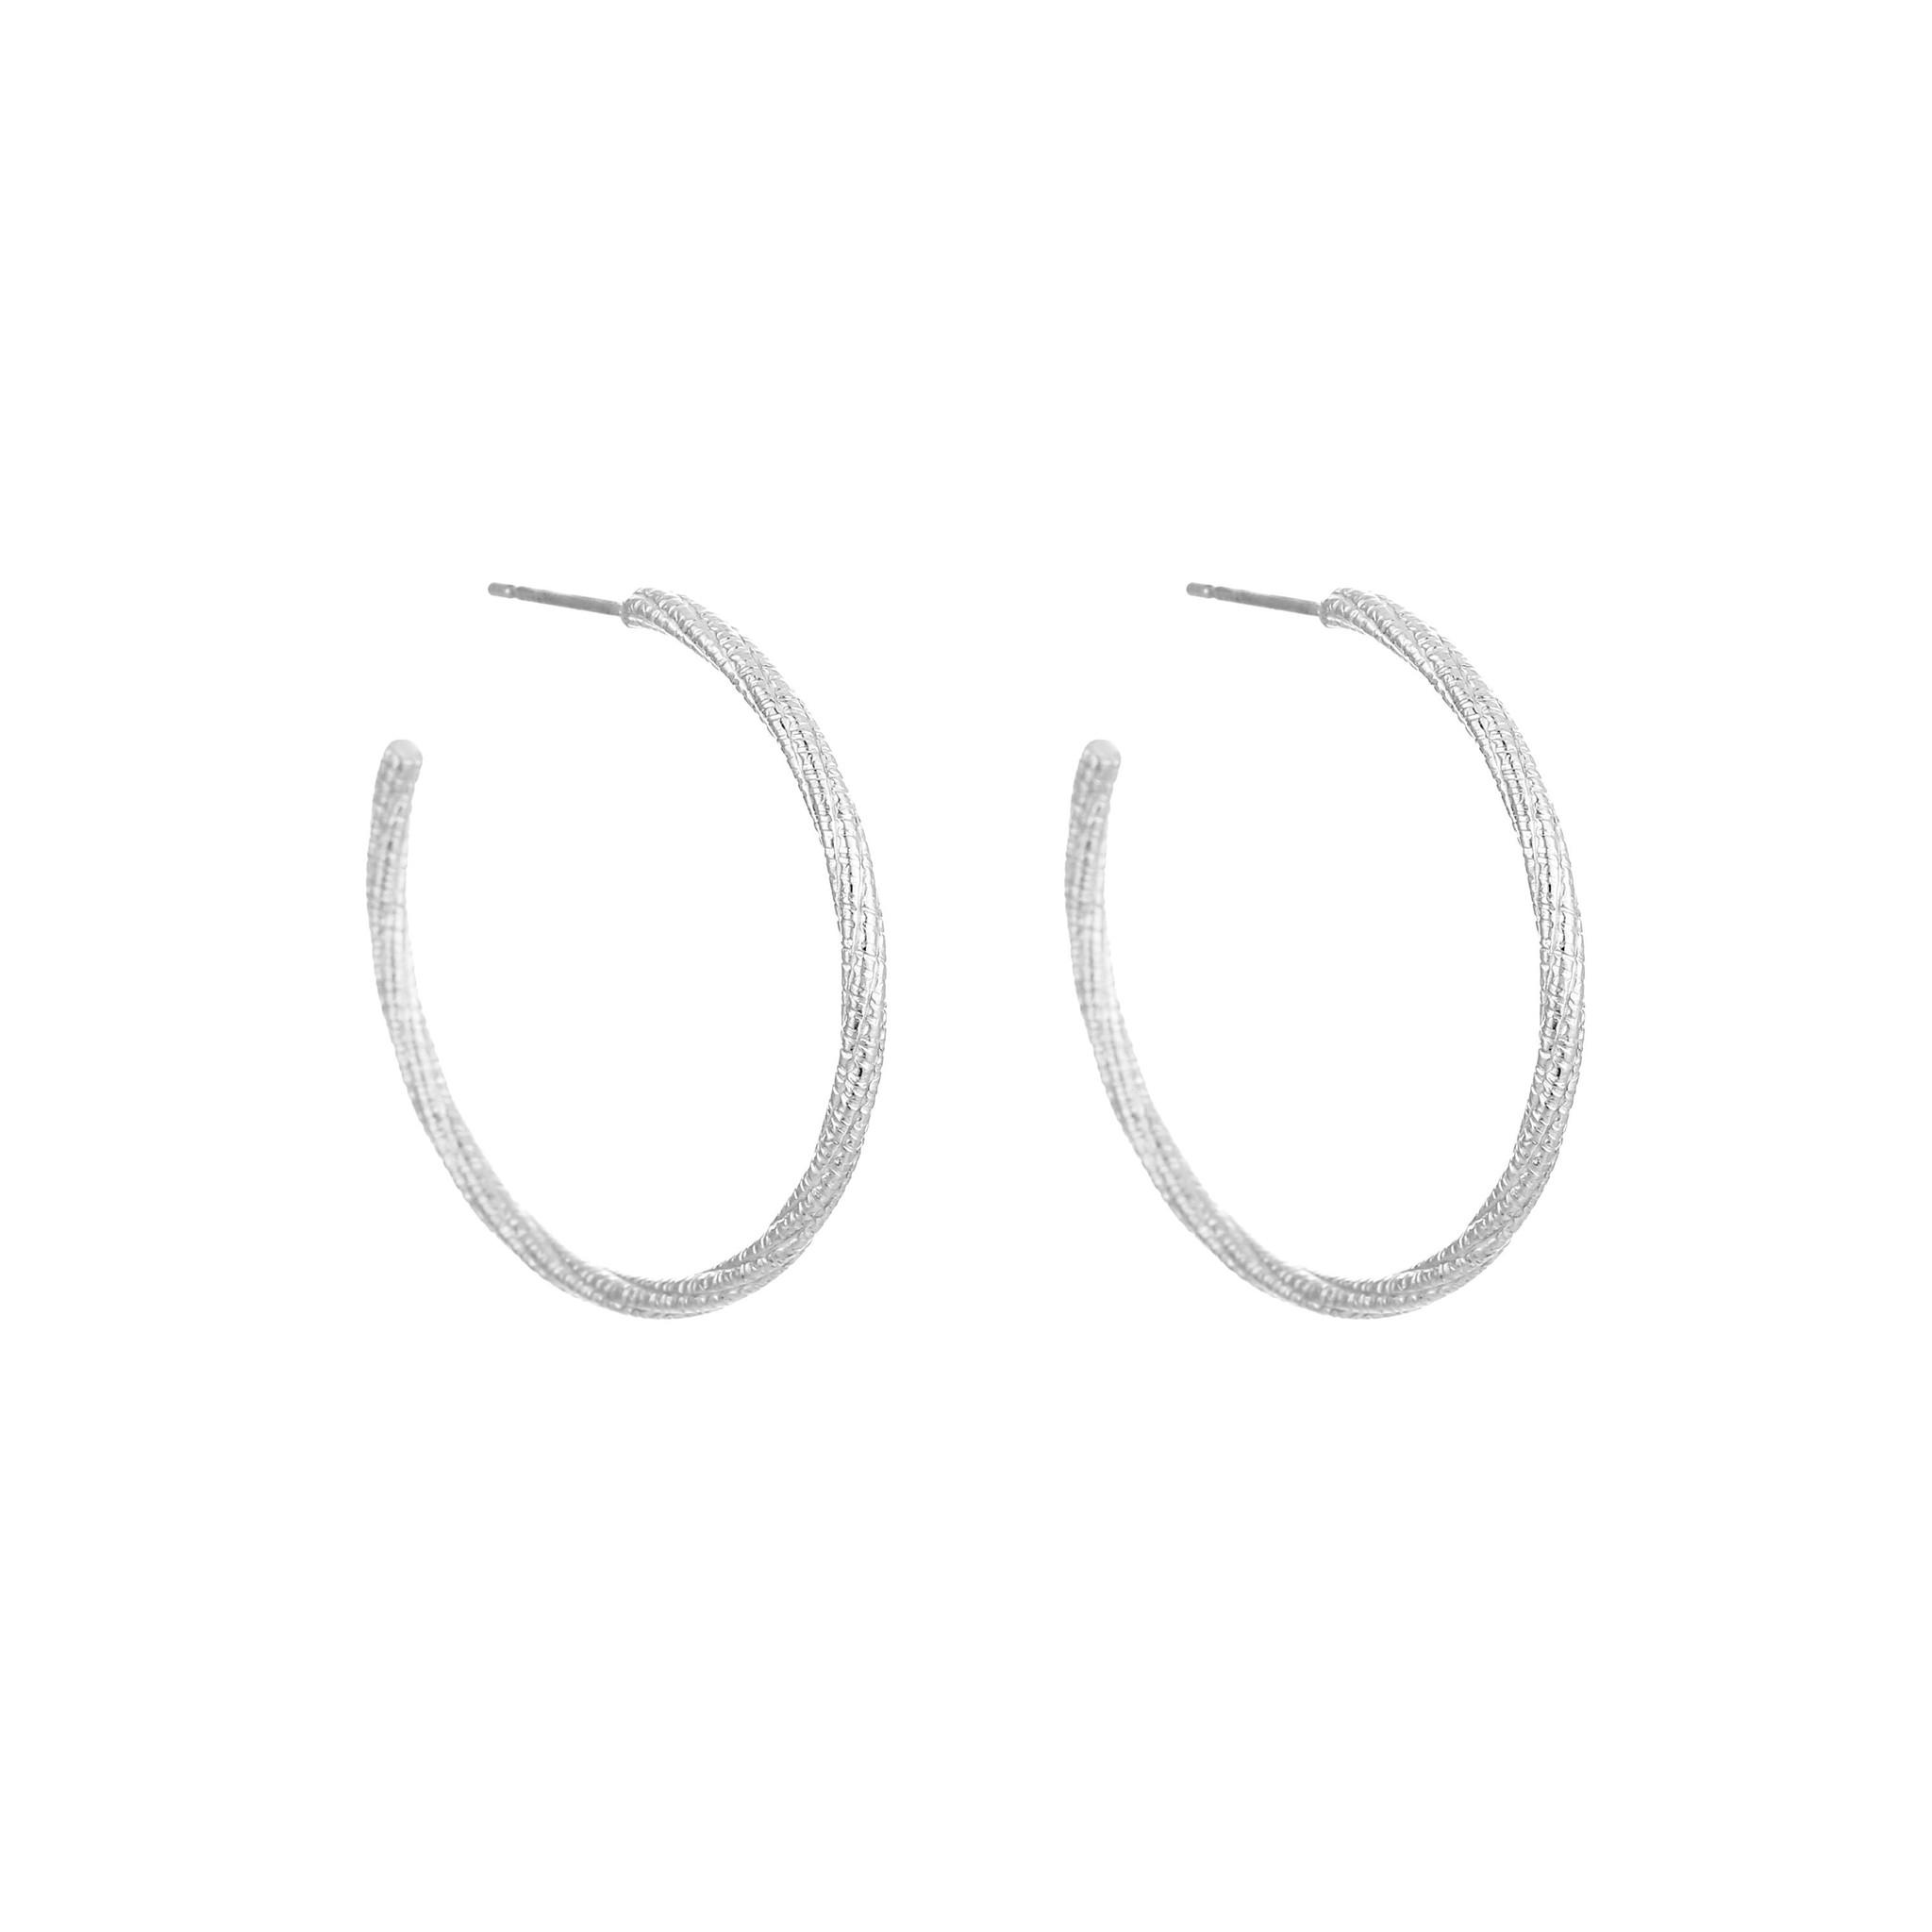 Stainless Steel Hoop Earrings with Shiney Pattern